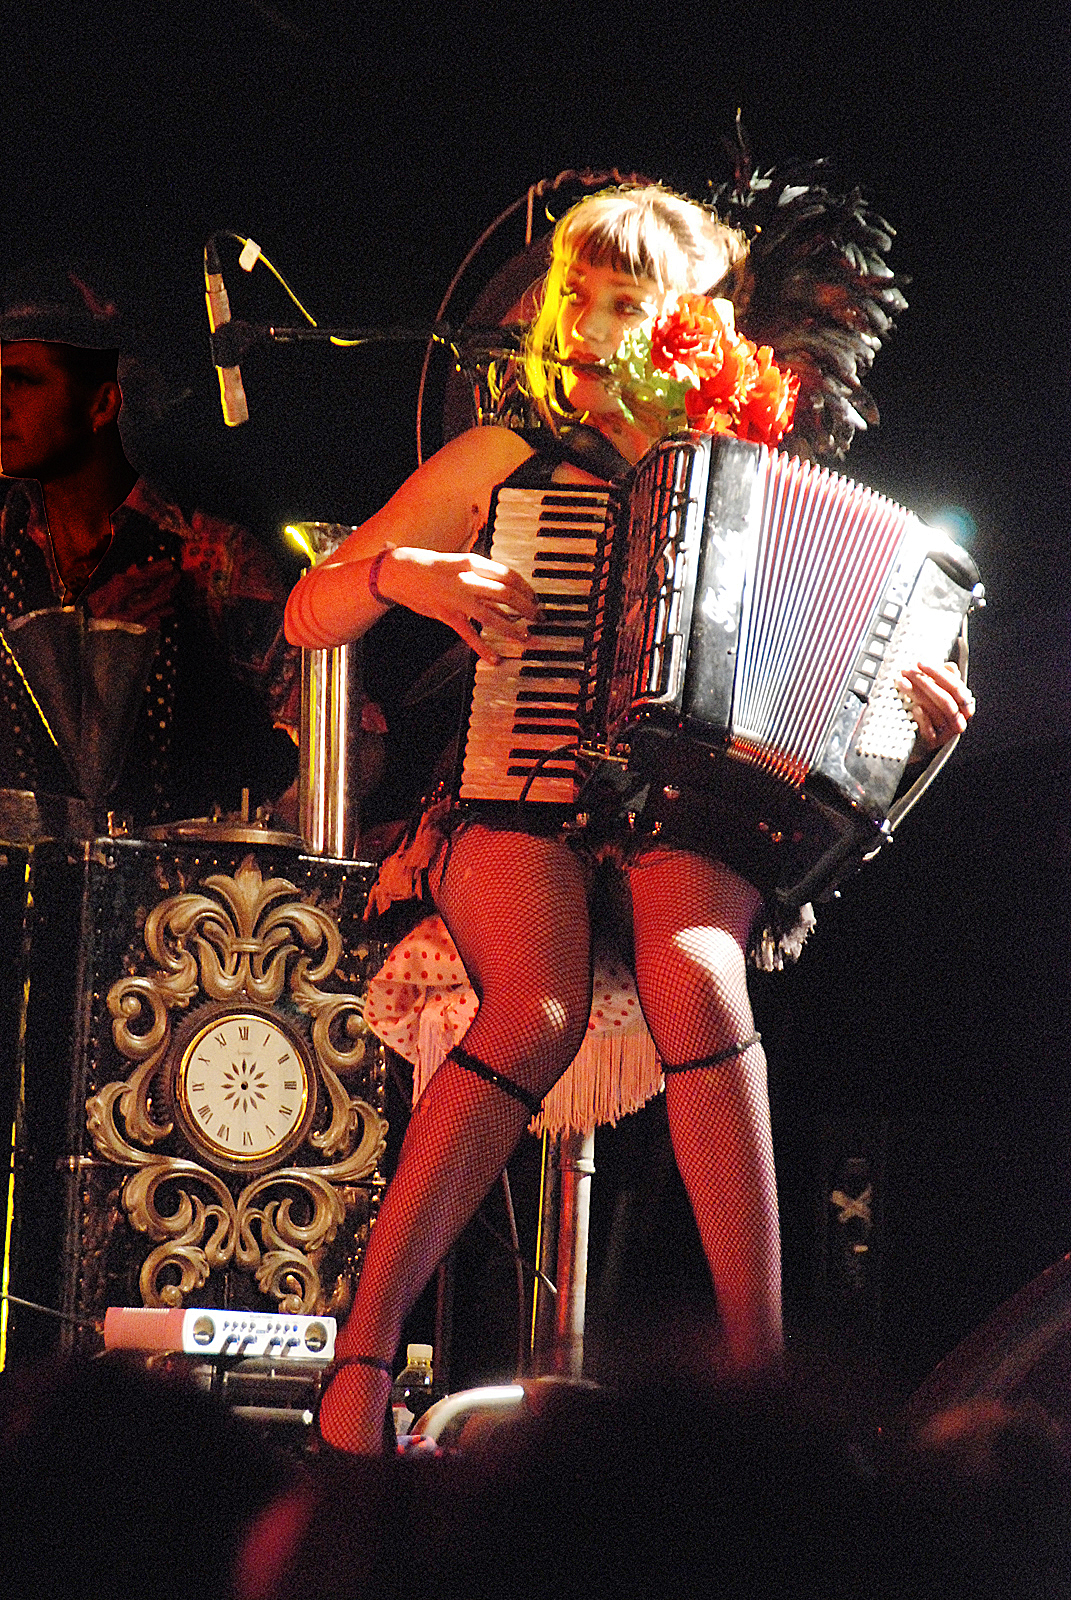 The accordion girl broke my heart